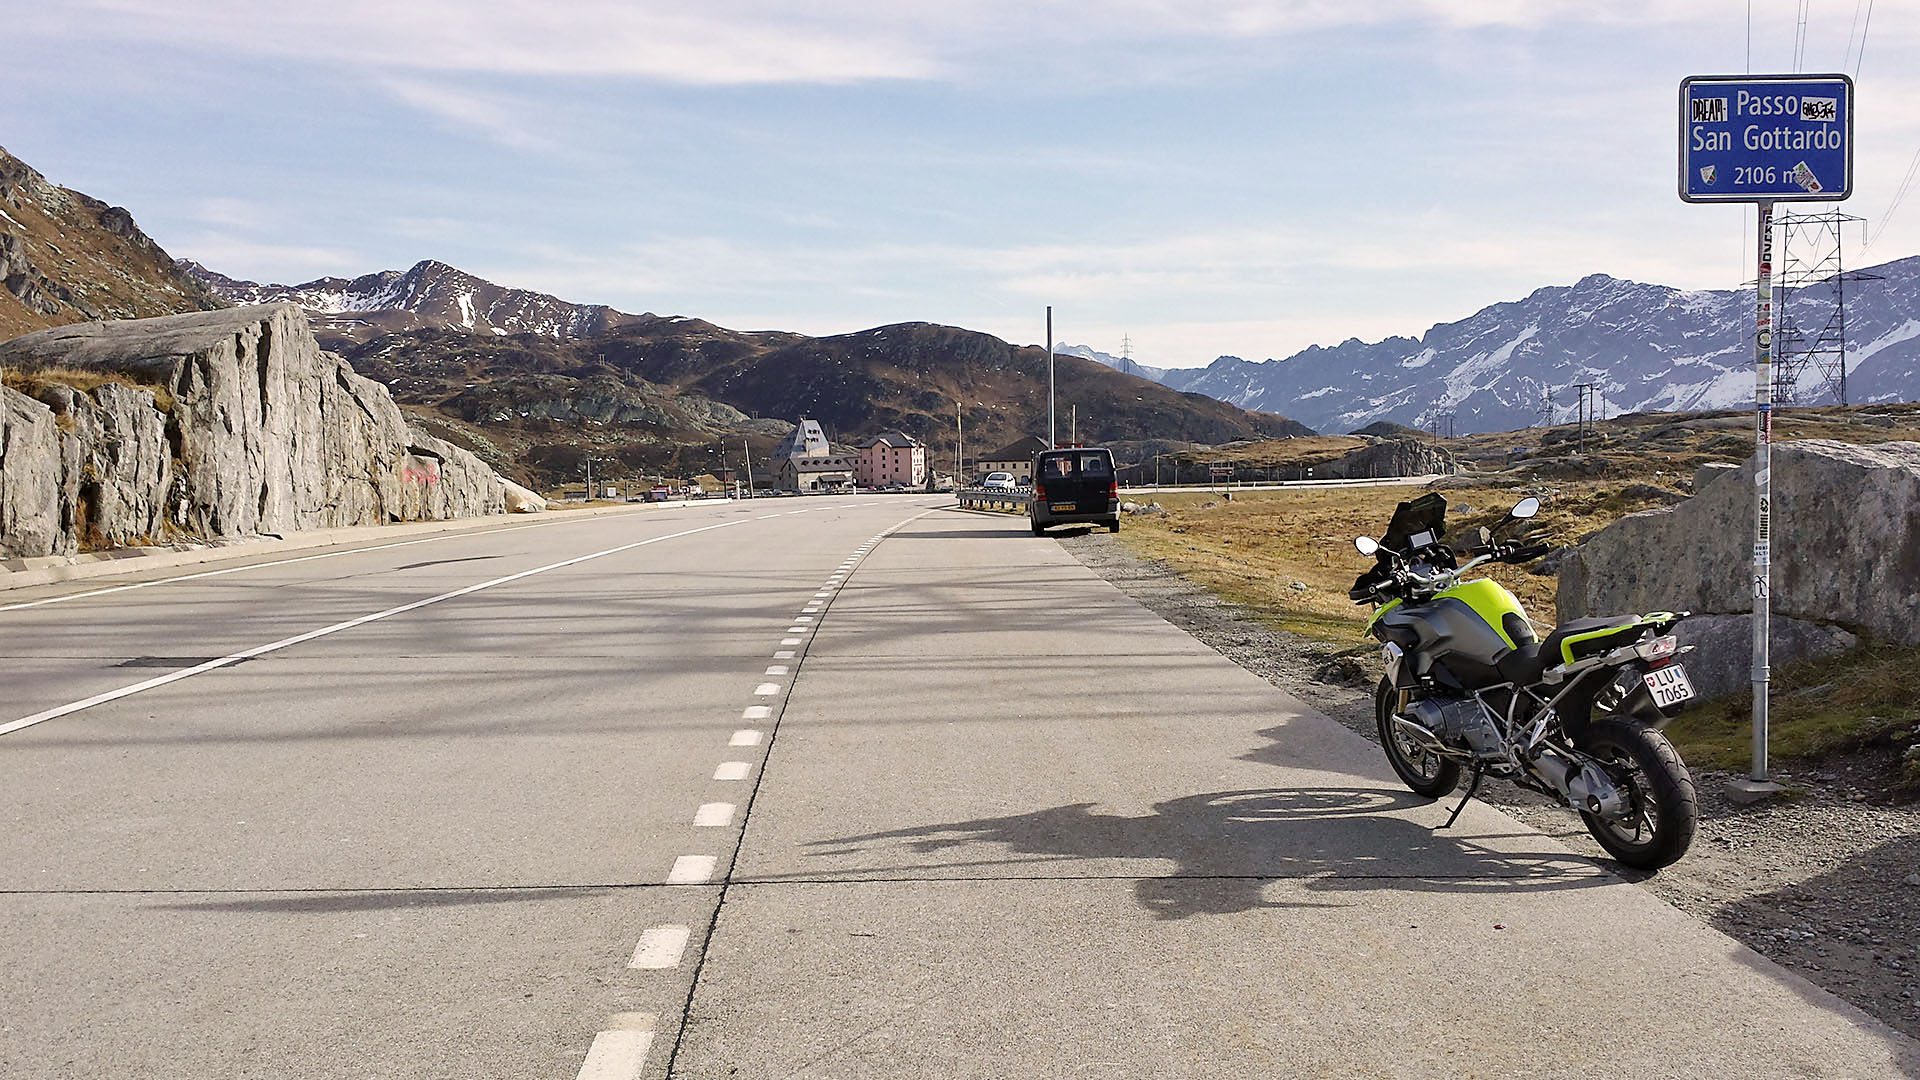 2106 - CH - Gotthard-Pass (Passo San Gottardo) © Pässe.Info